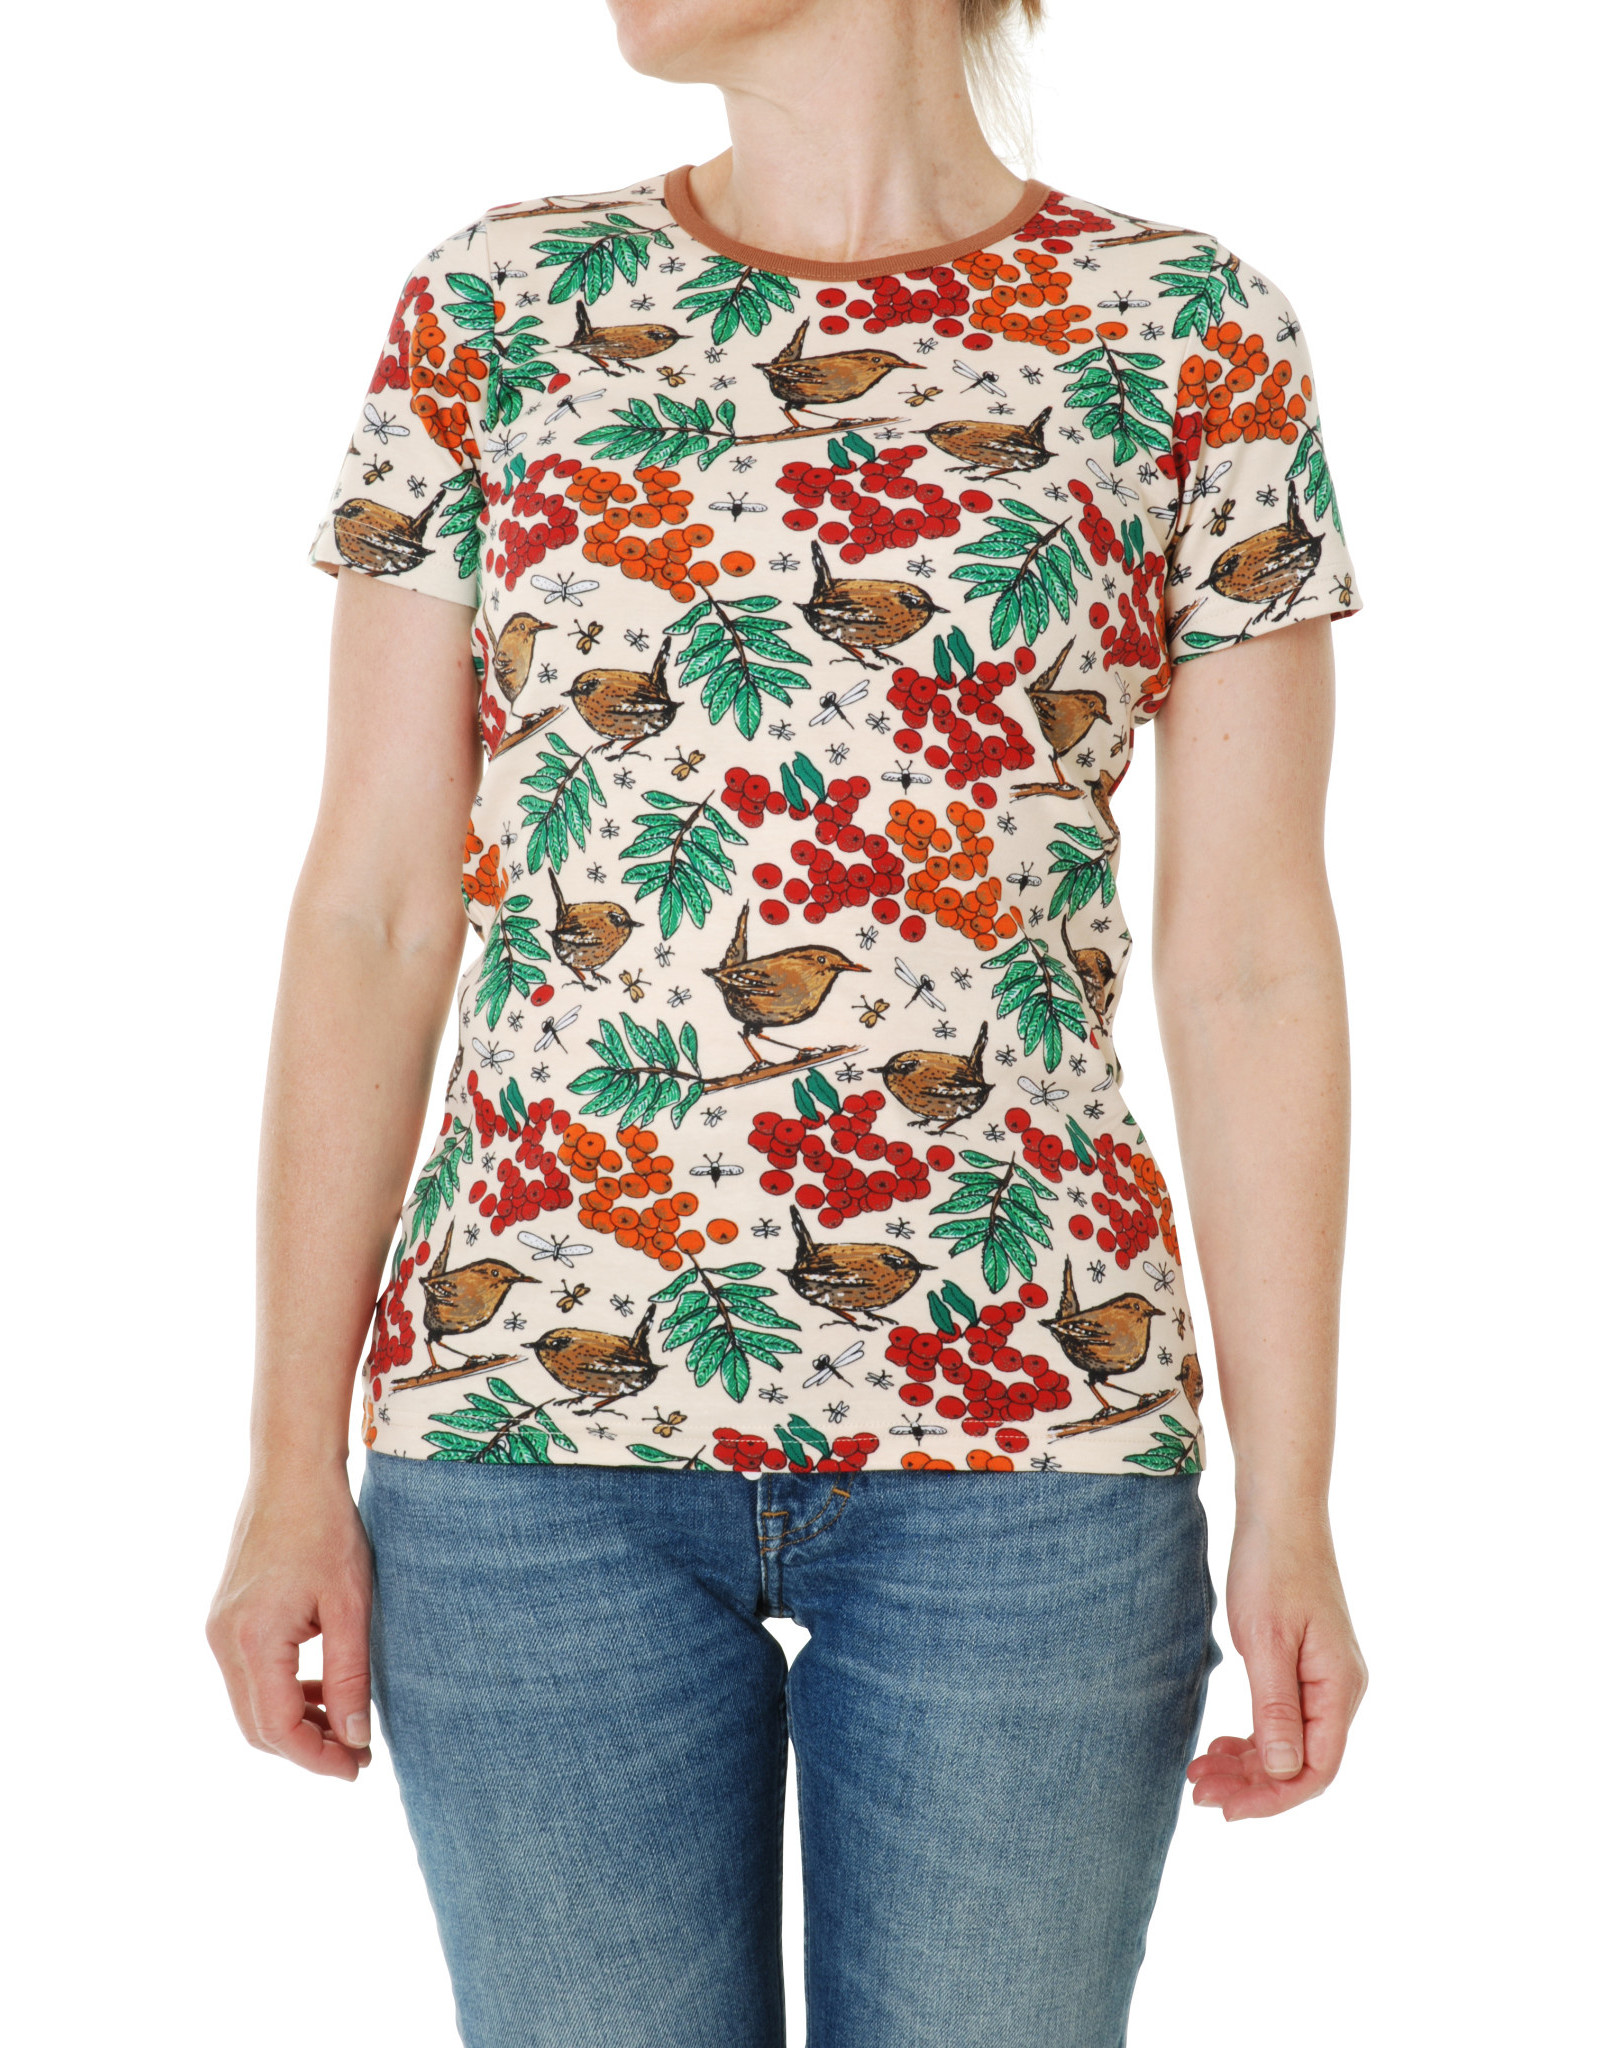 Duns VOLWASSENEN T-shirt vogels en blaadjes print